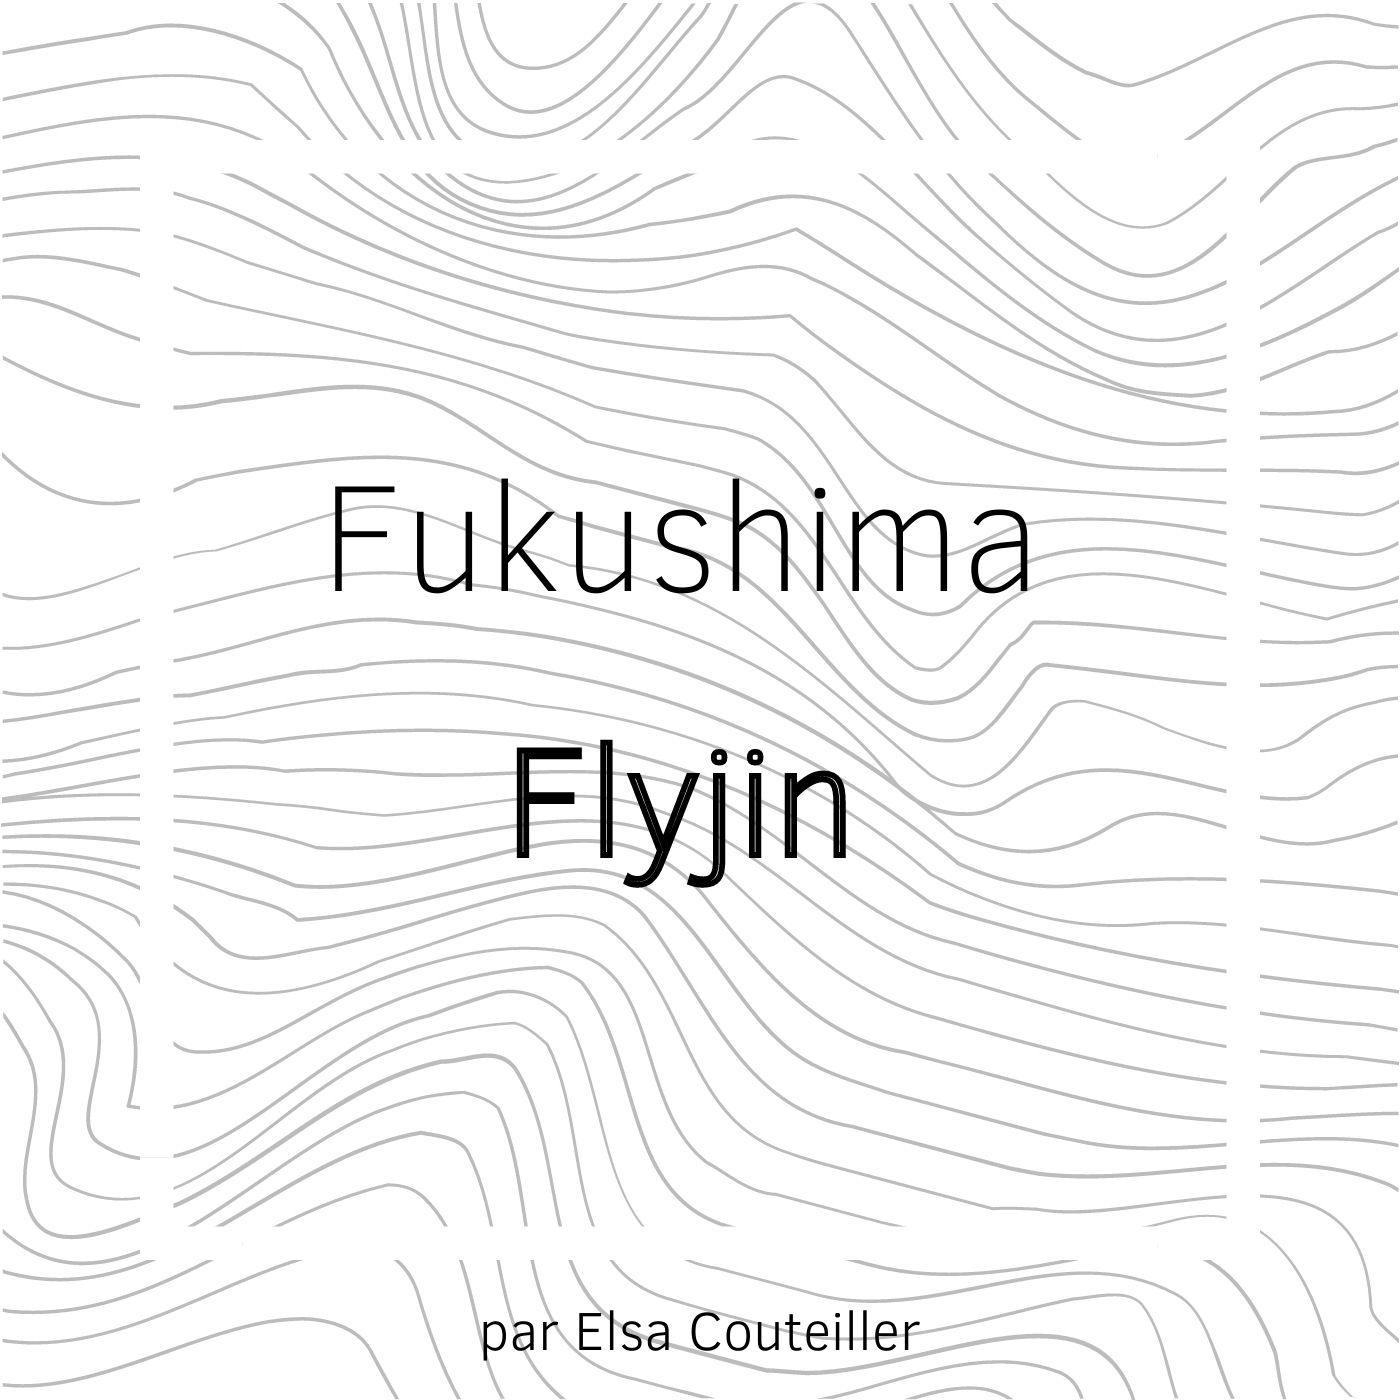 Show artwork for Fukushima Flyjin